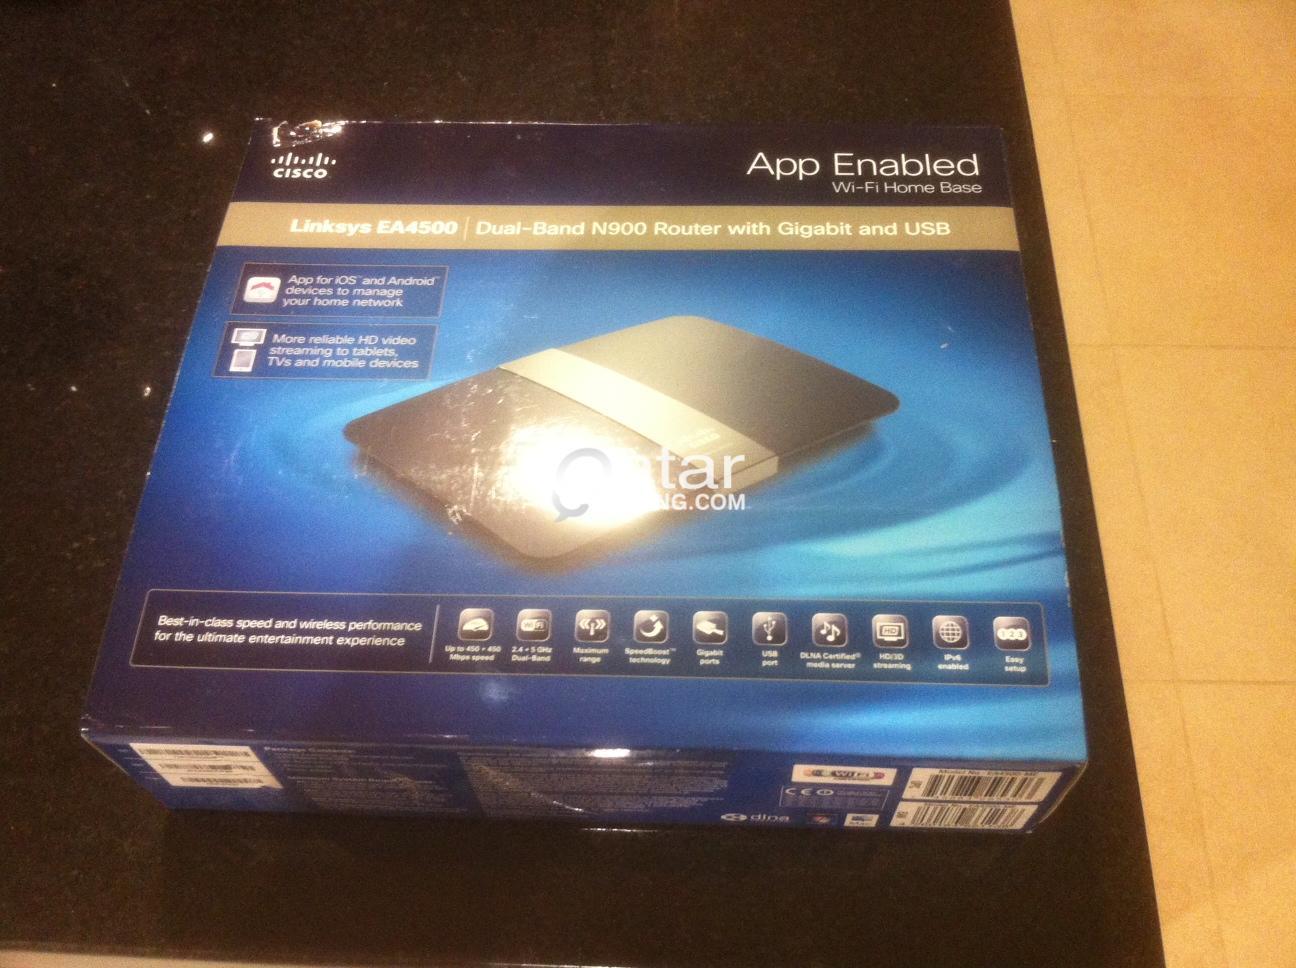 Linksys EA4500 Dual Band N900 Router | Qatar Living